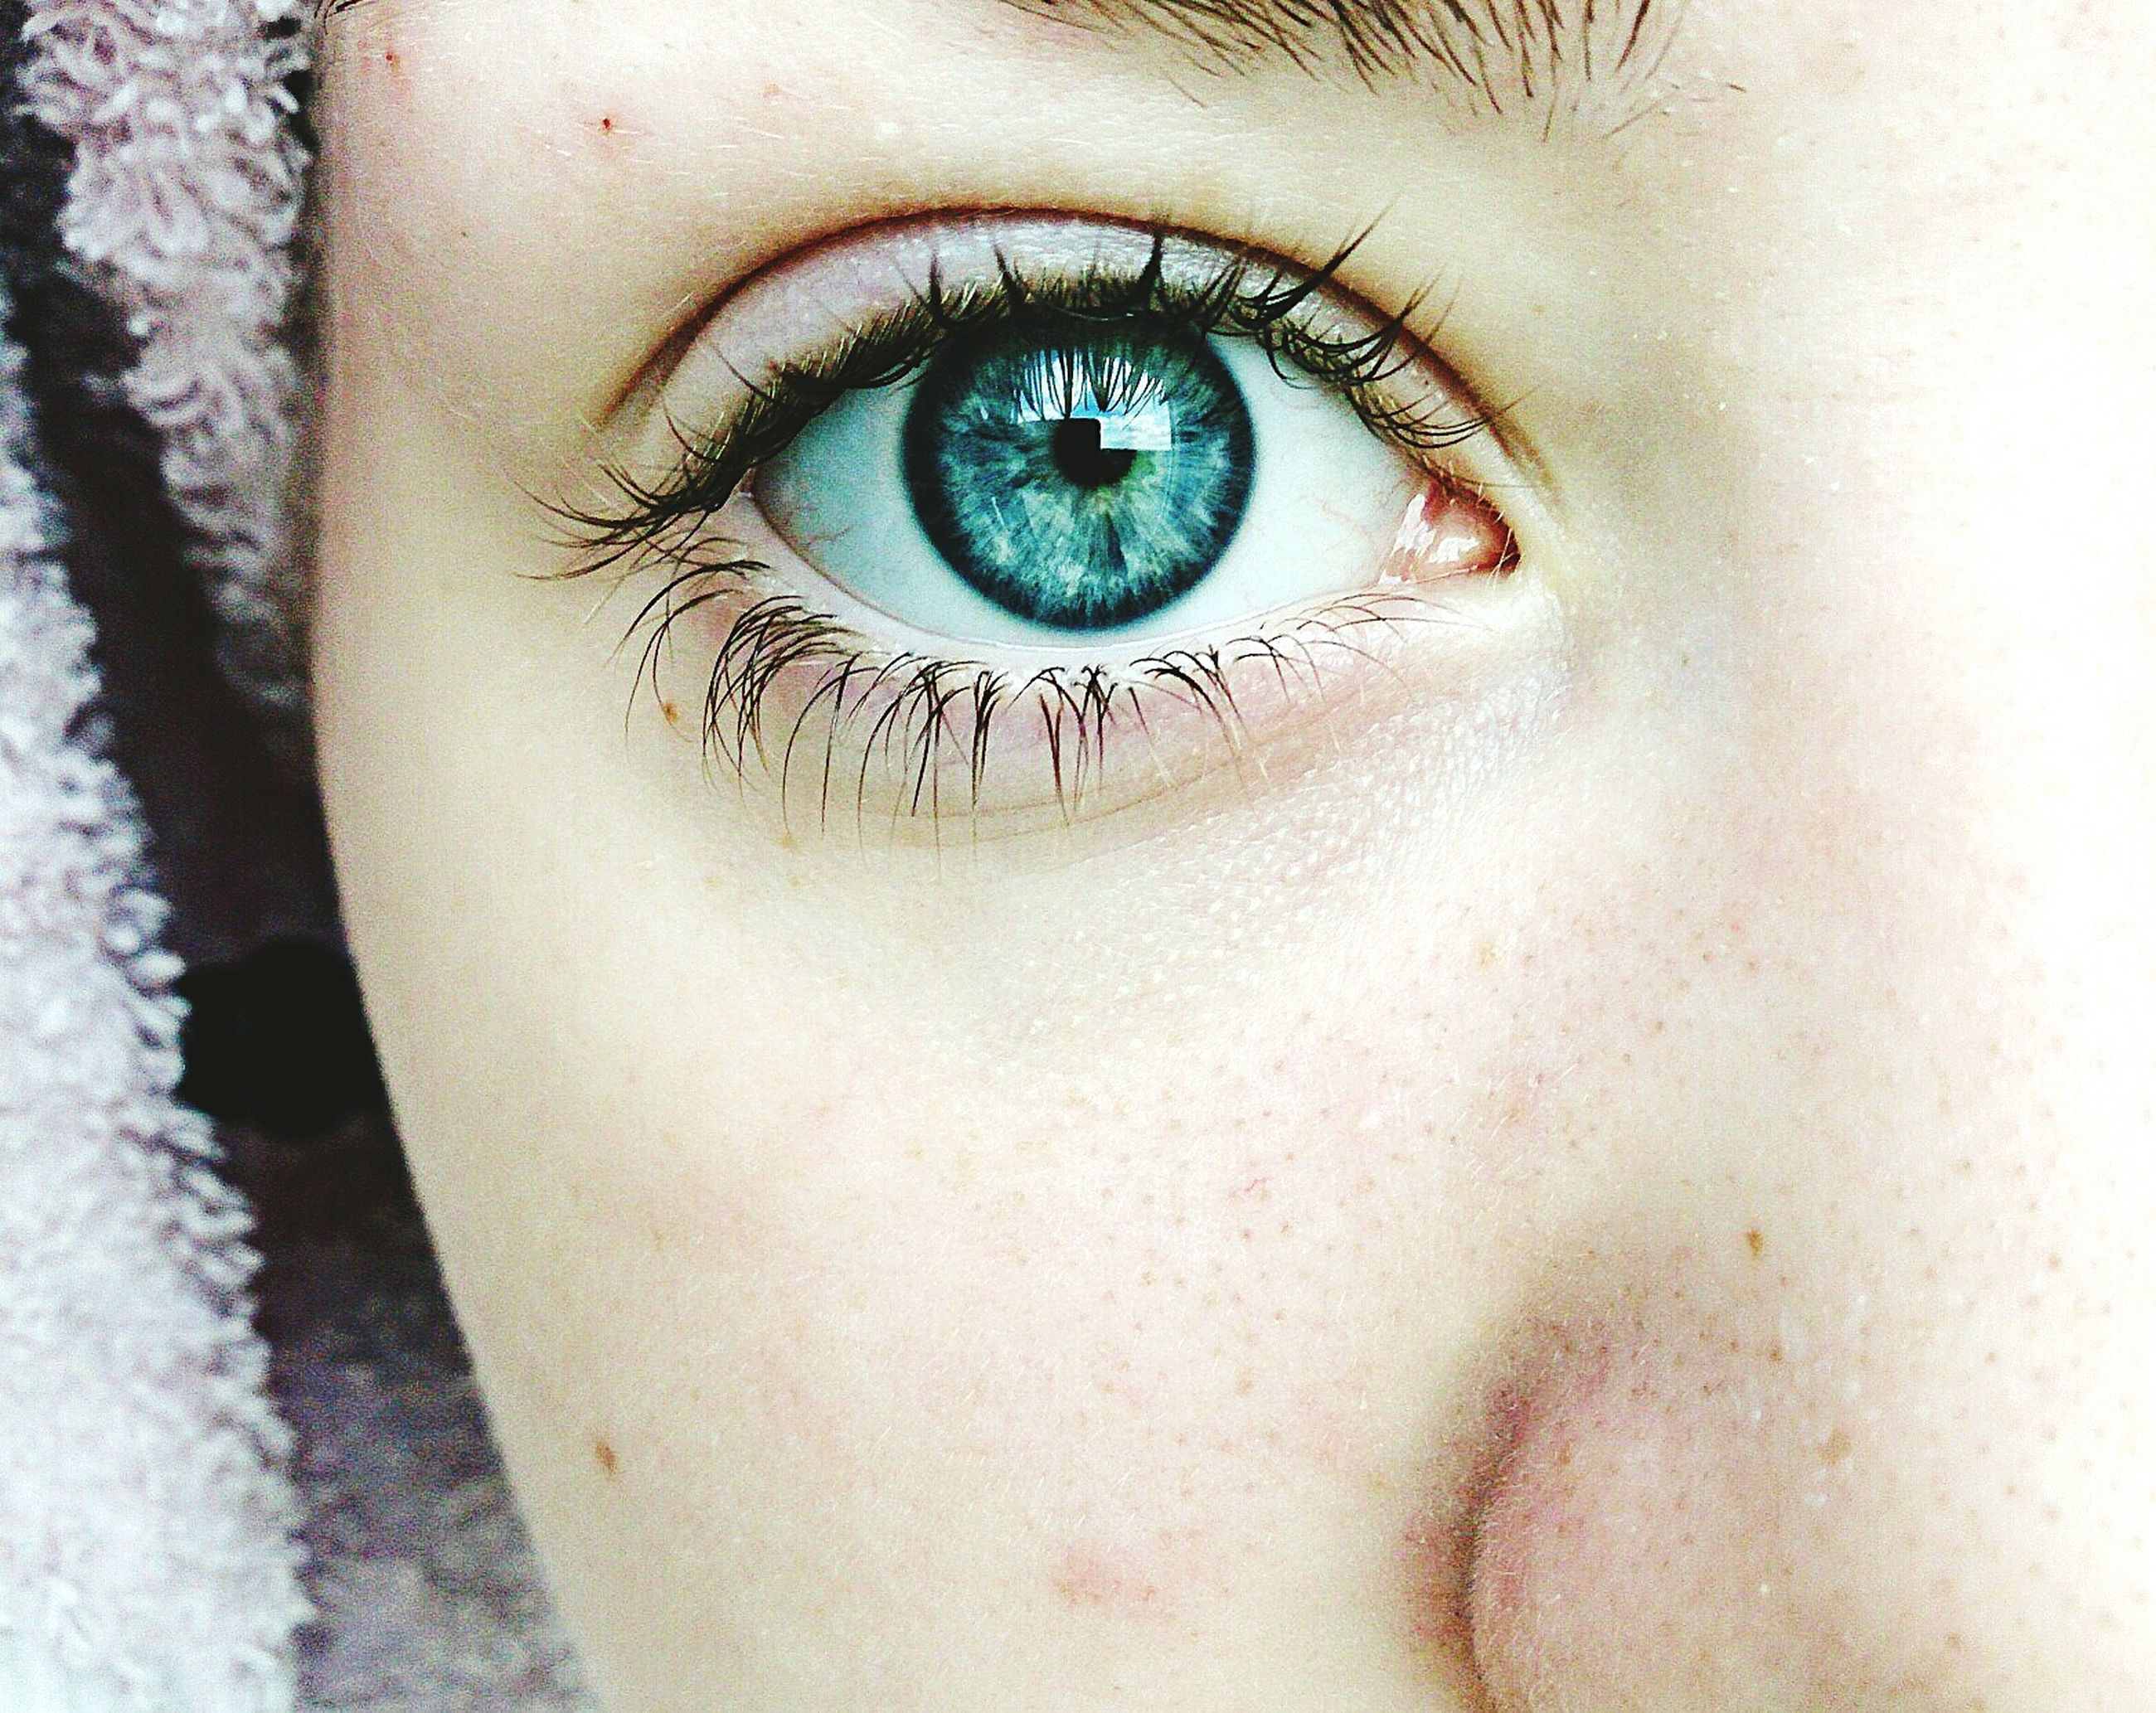 human eye, close-up, eyelash, eyesight, human skin, part of, portrait, human face, extreme close-up, sensory perception, lifestyles, iris - eye, eyeball, cropped, detail, macro, extreme close up, selective focus